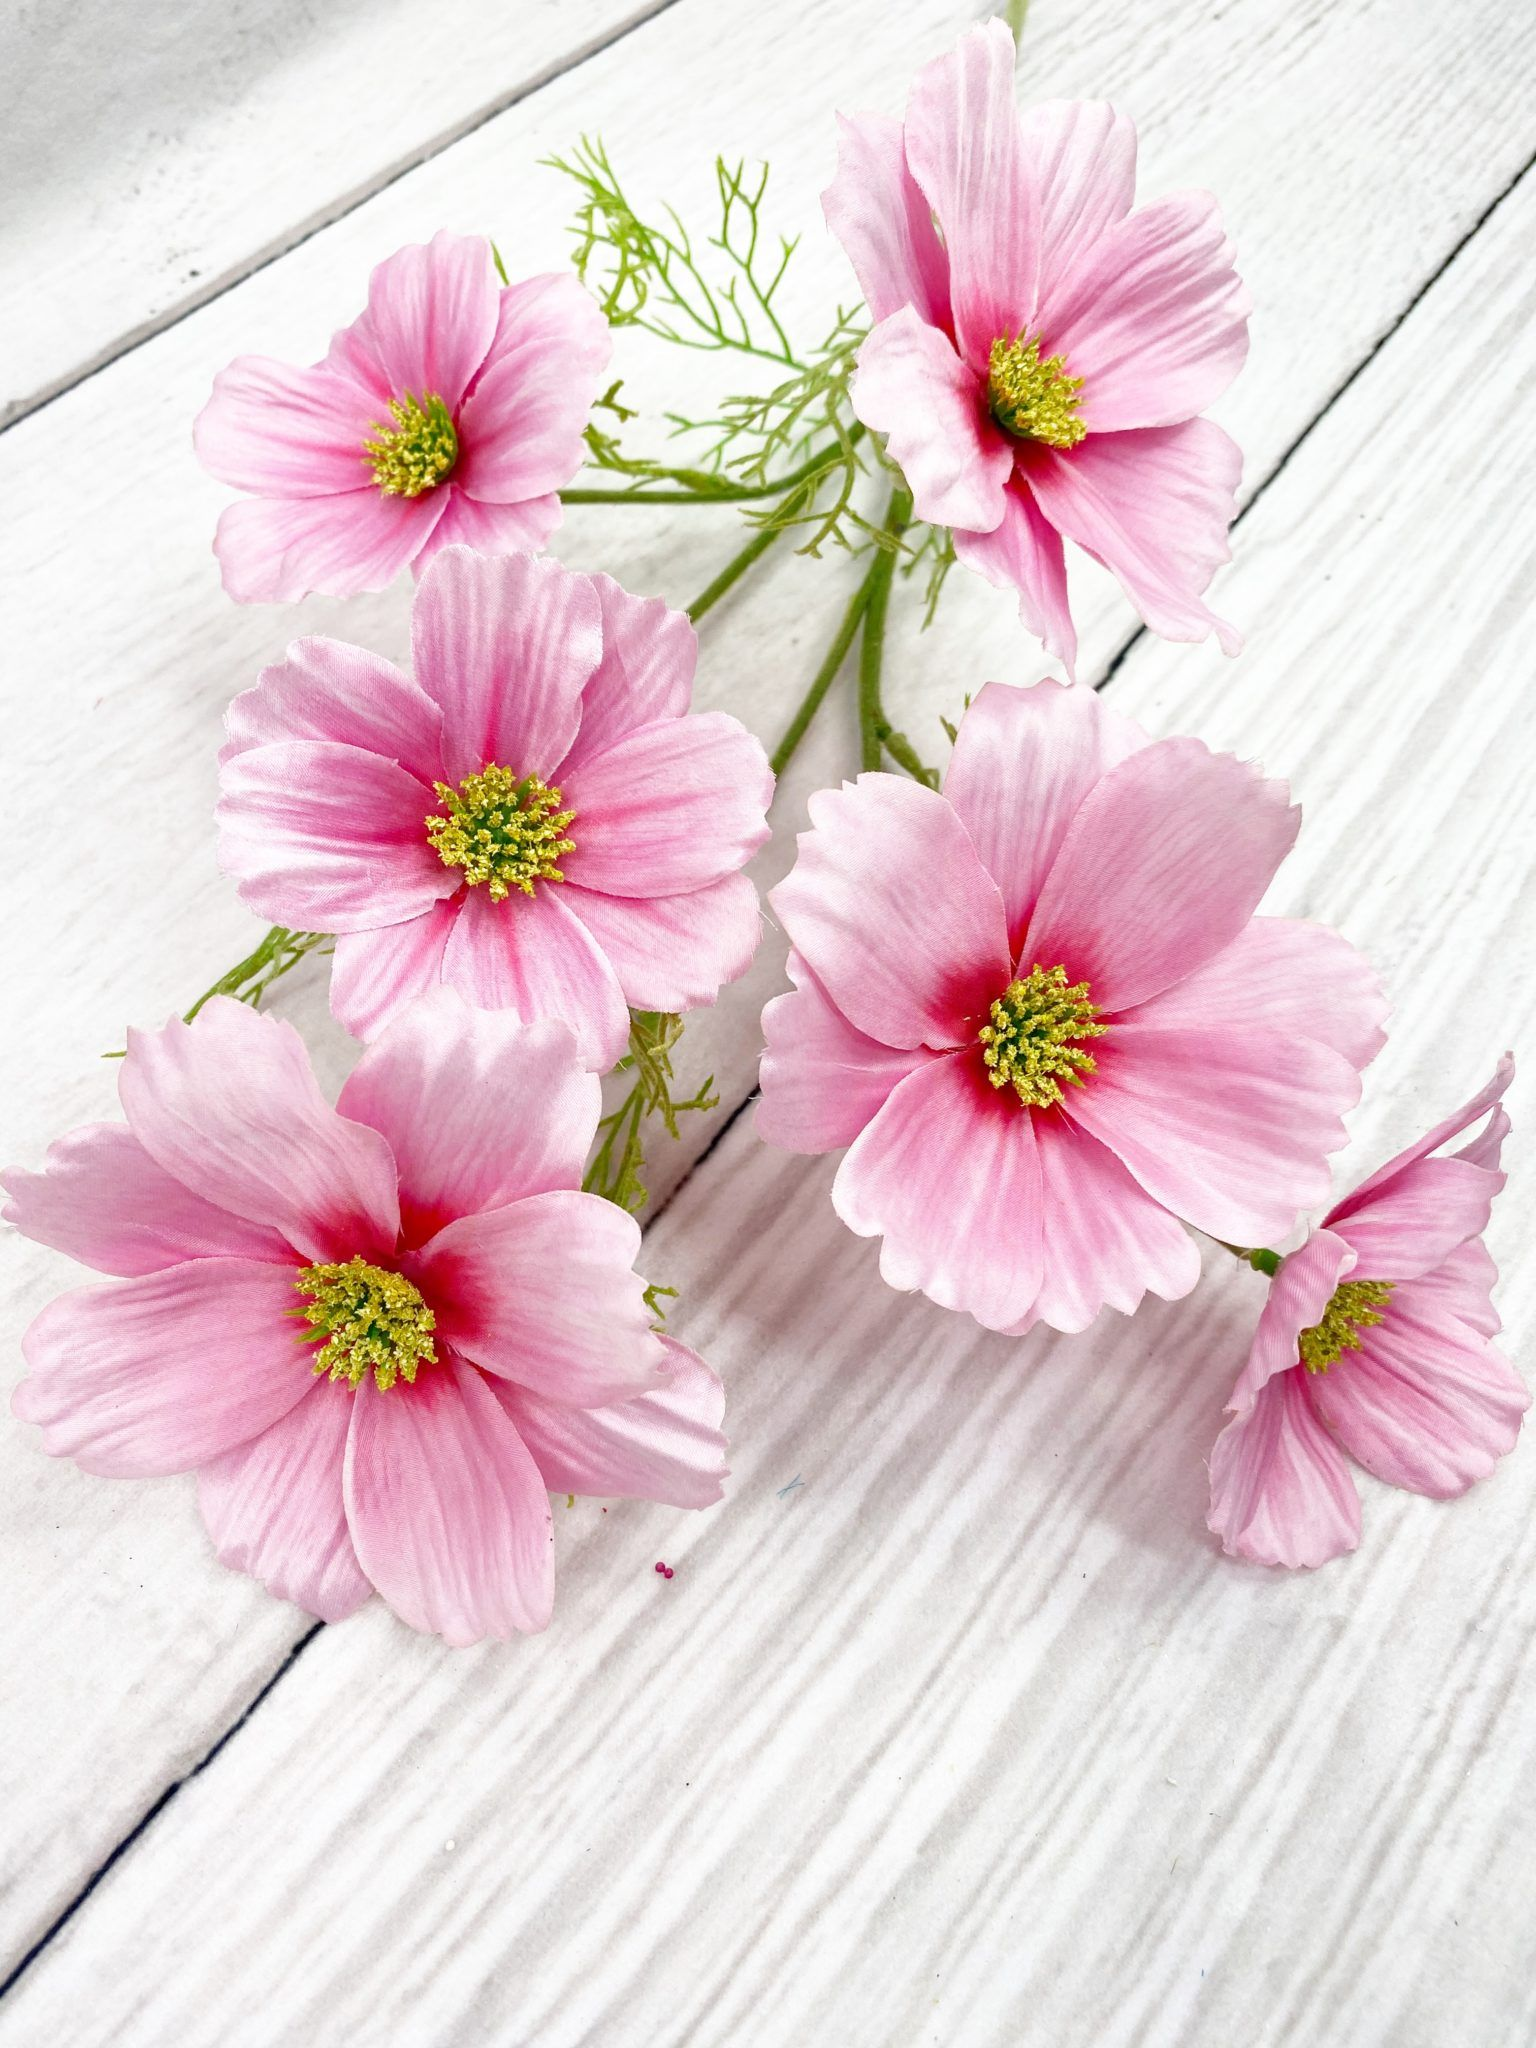 Pink Cosmo Stem Kelea S Florals In 2020 Floral Flower Making Spring Floral